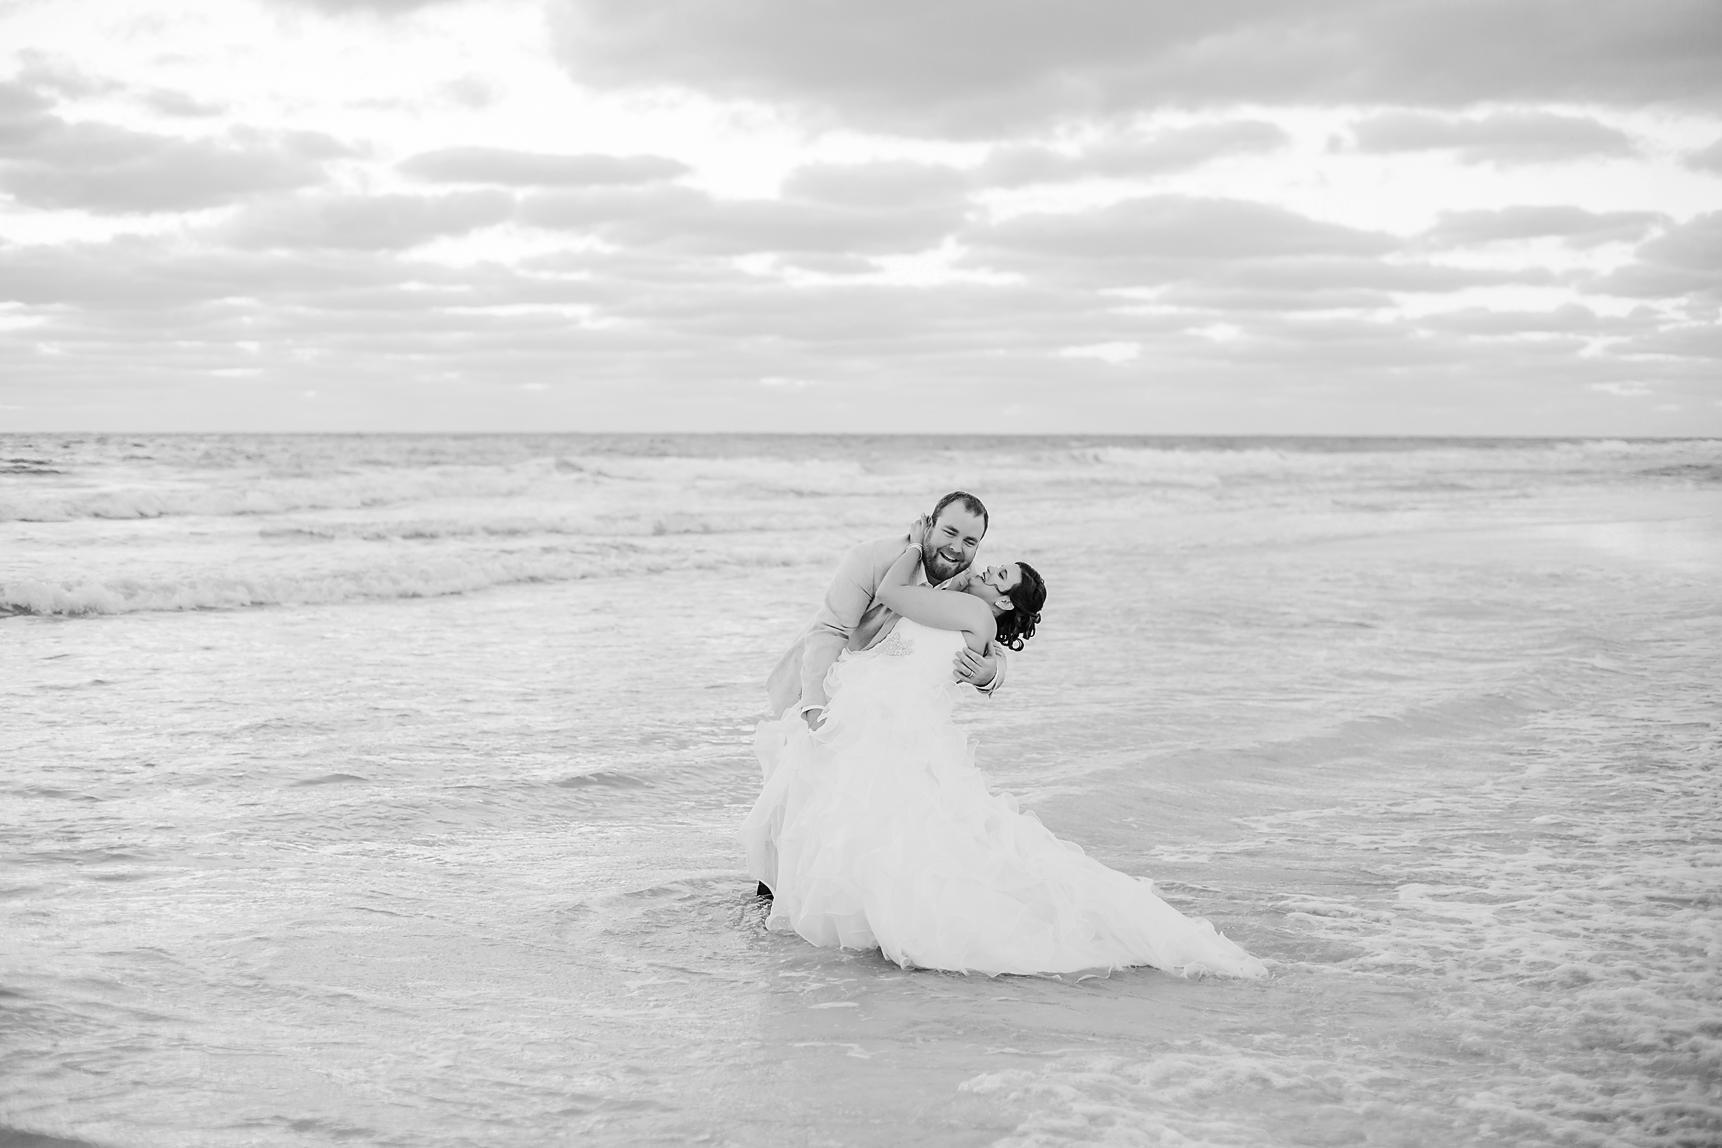 Bailey + Chalin - Anna Maria Island Wedding Photographer - Destination Wedding Photography - Emily & Co. Photography - Beach Wedding Photography 198.jpg